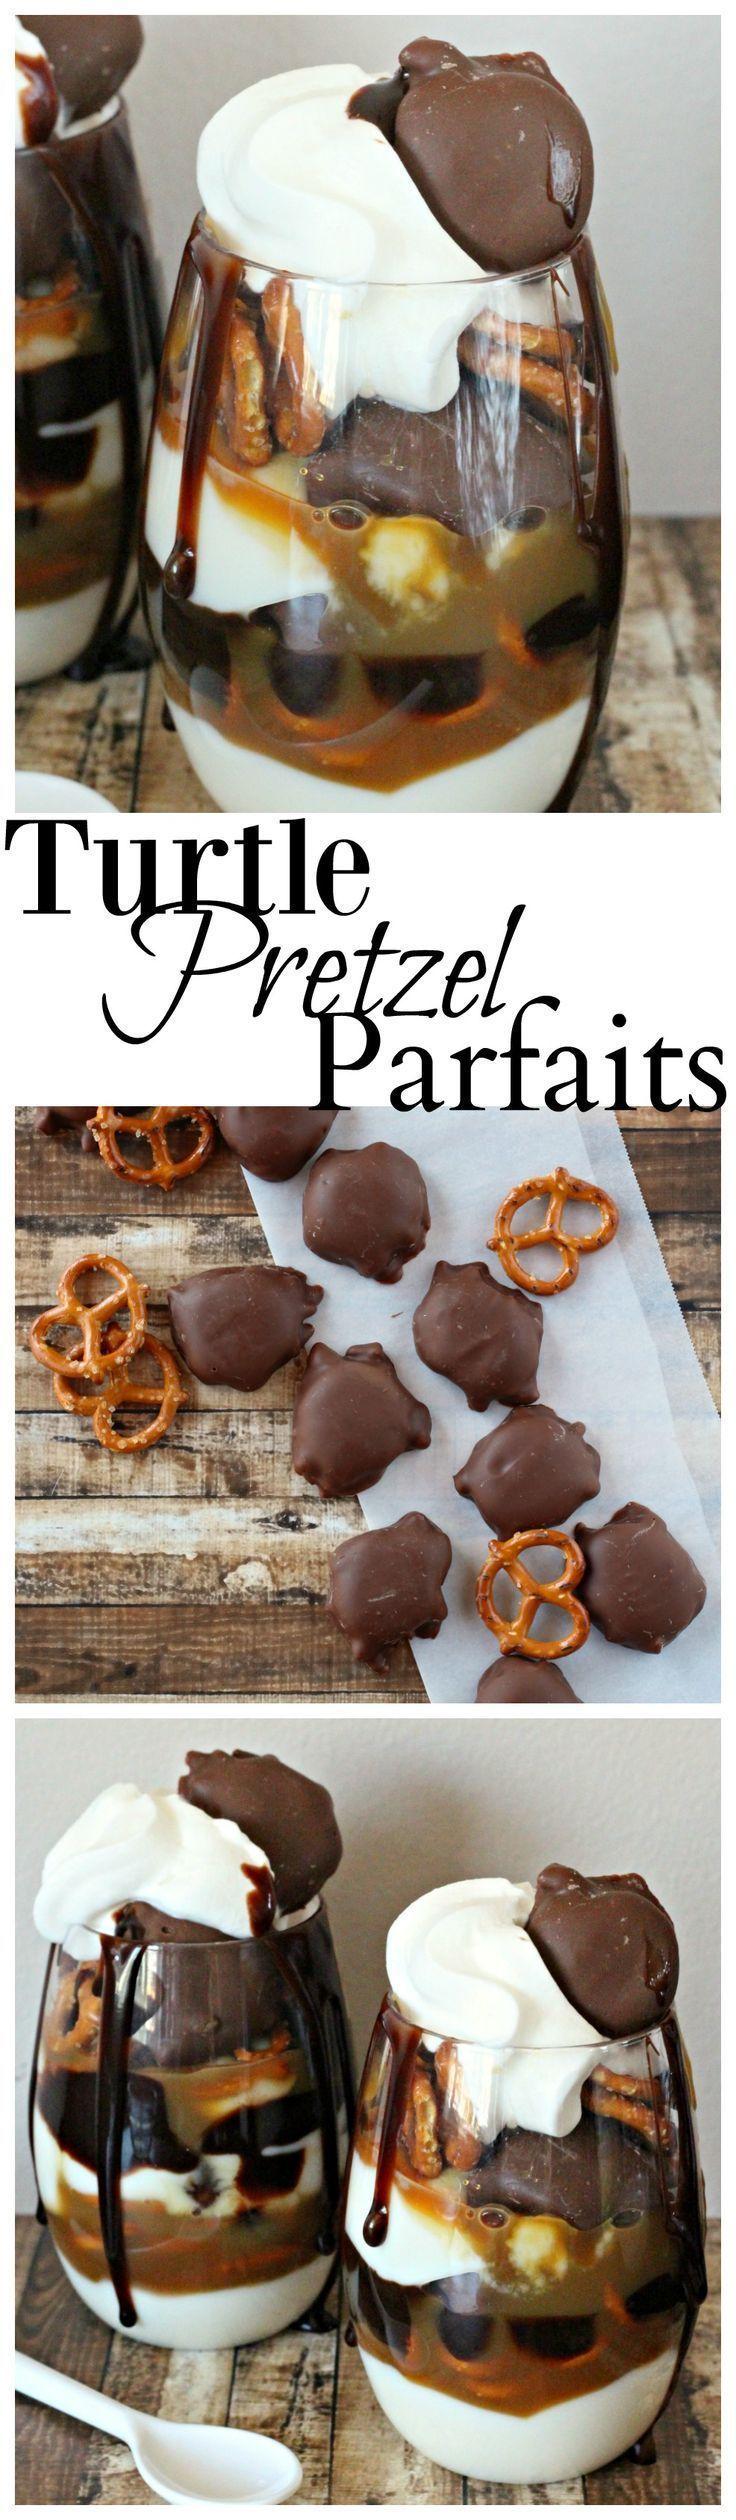 Layers of vanilla yogurt, caramel, fudge, pretzels, and turtle caramel nut clusters make for a delicious parfait.